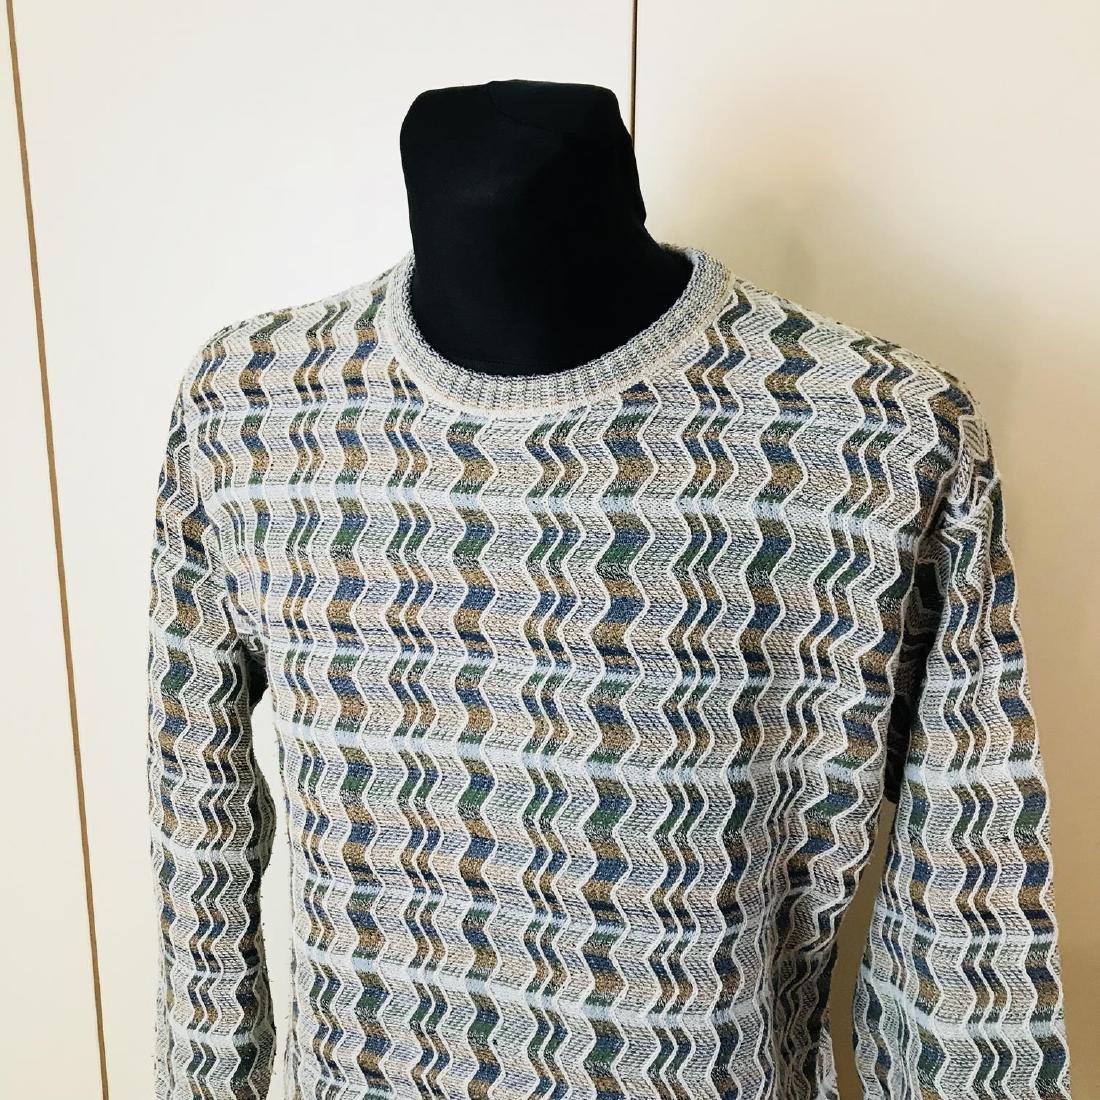 Vintage Men's DRAGON Italian Sweater Size M - 2